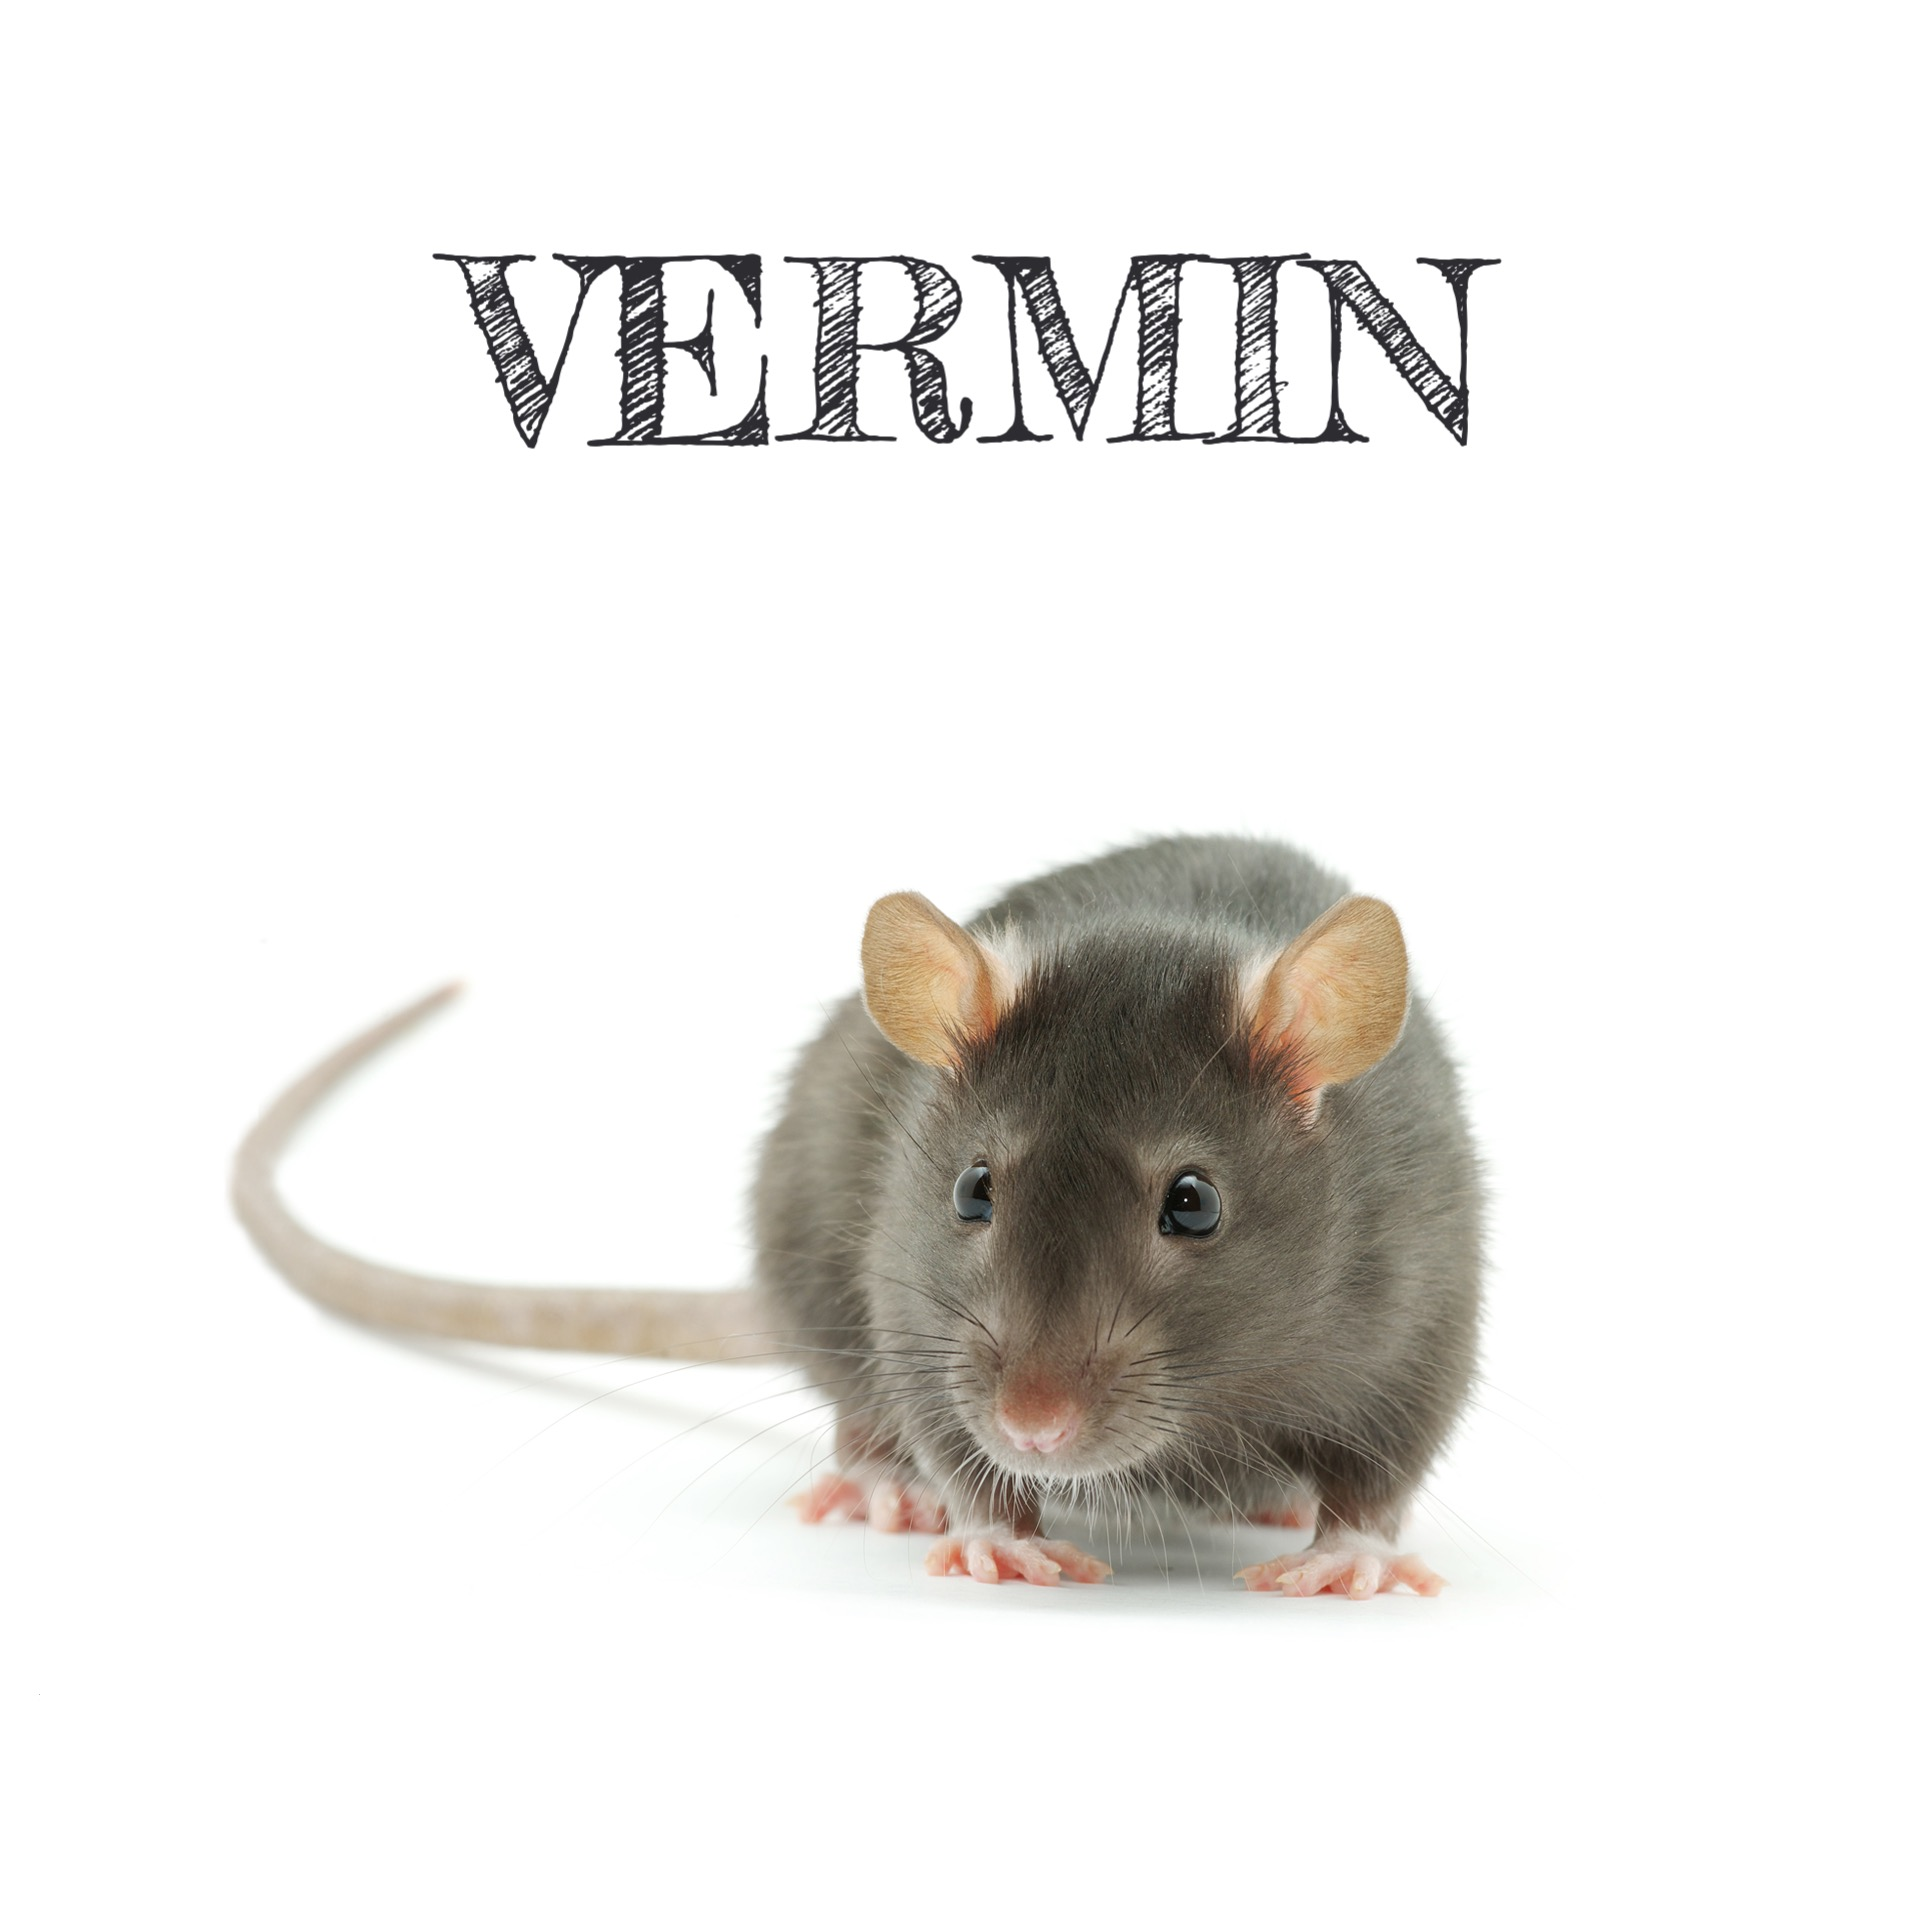 VERMIN control uk